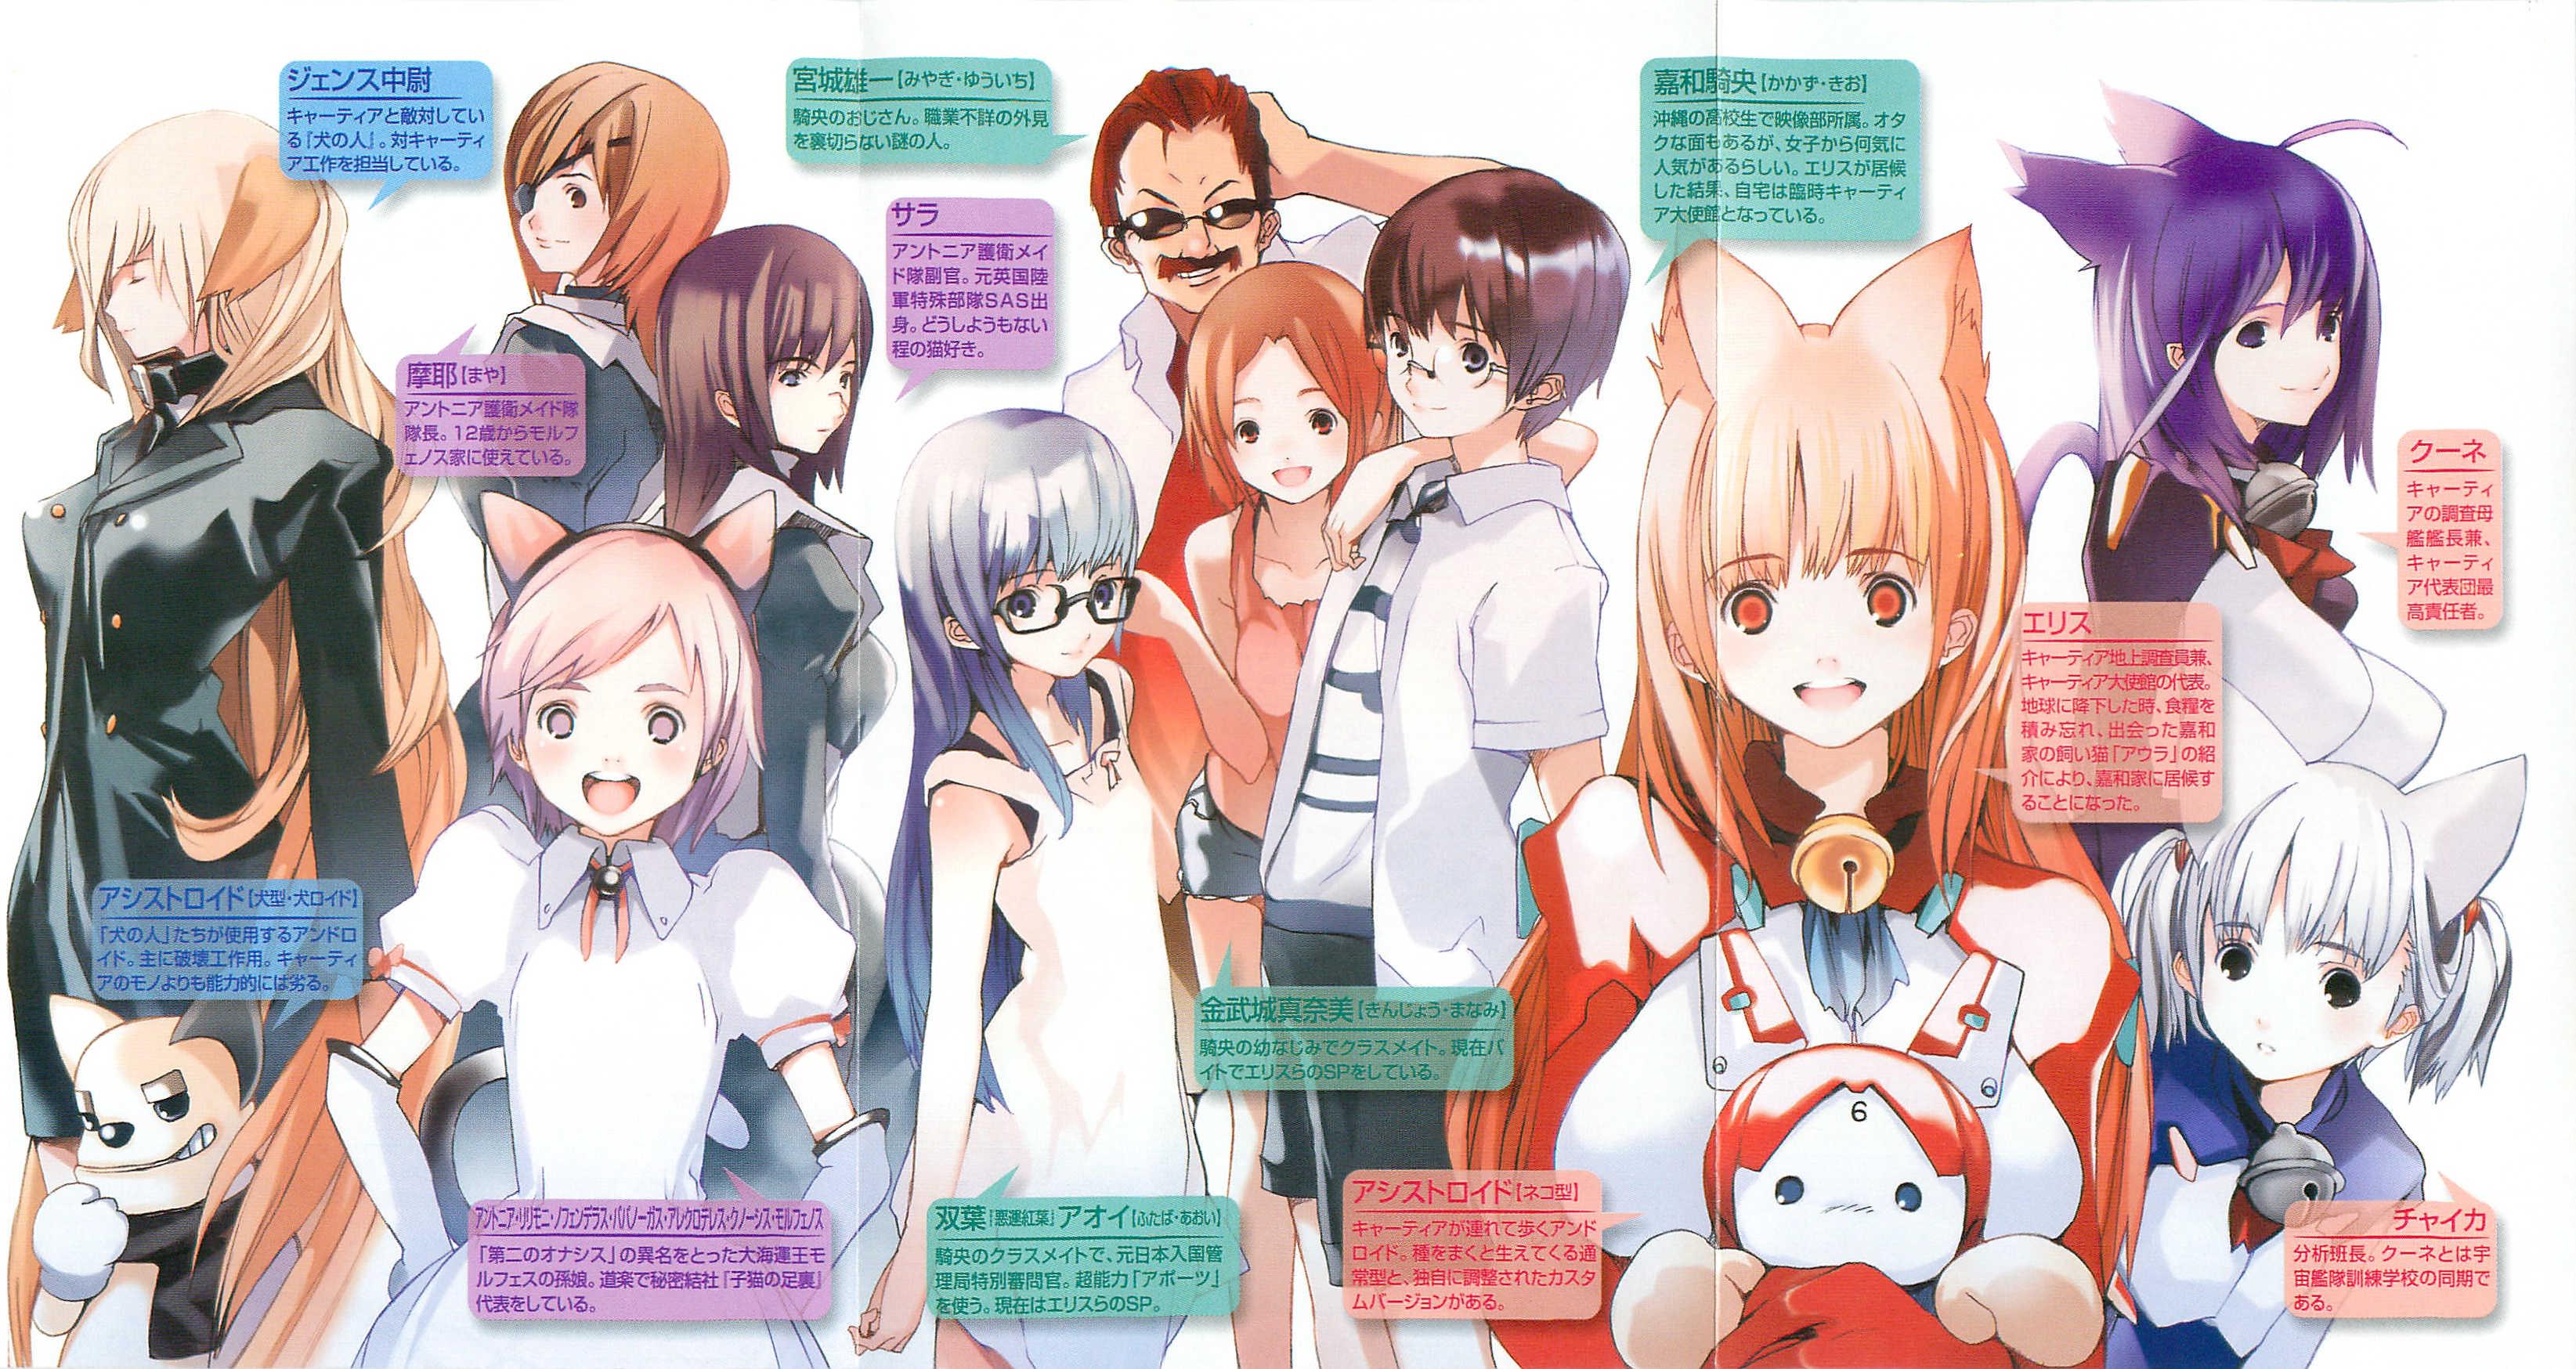 Asobi Ni Iku Yo Wallpaper 251318 Zerochan Anime Image Board